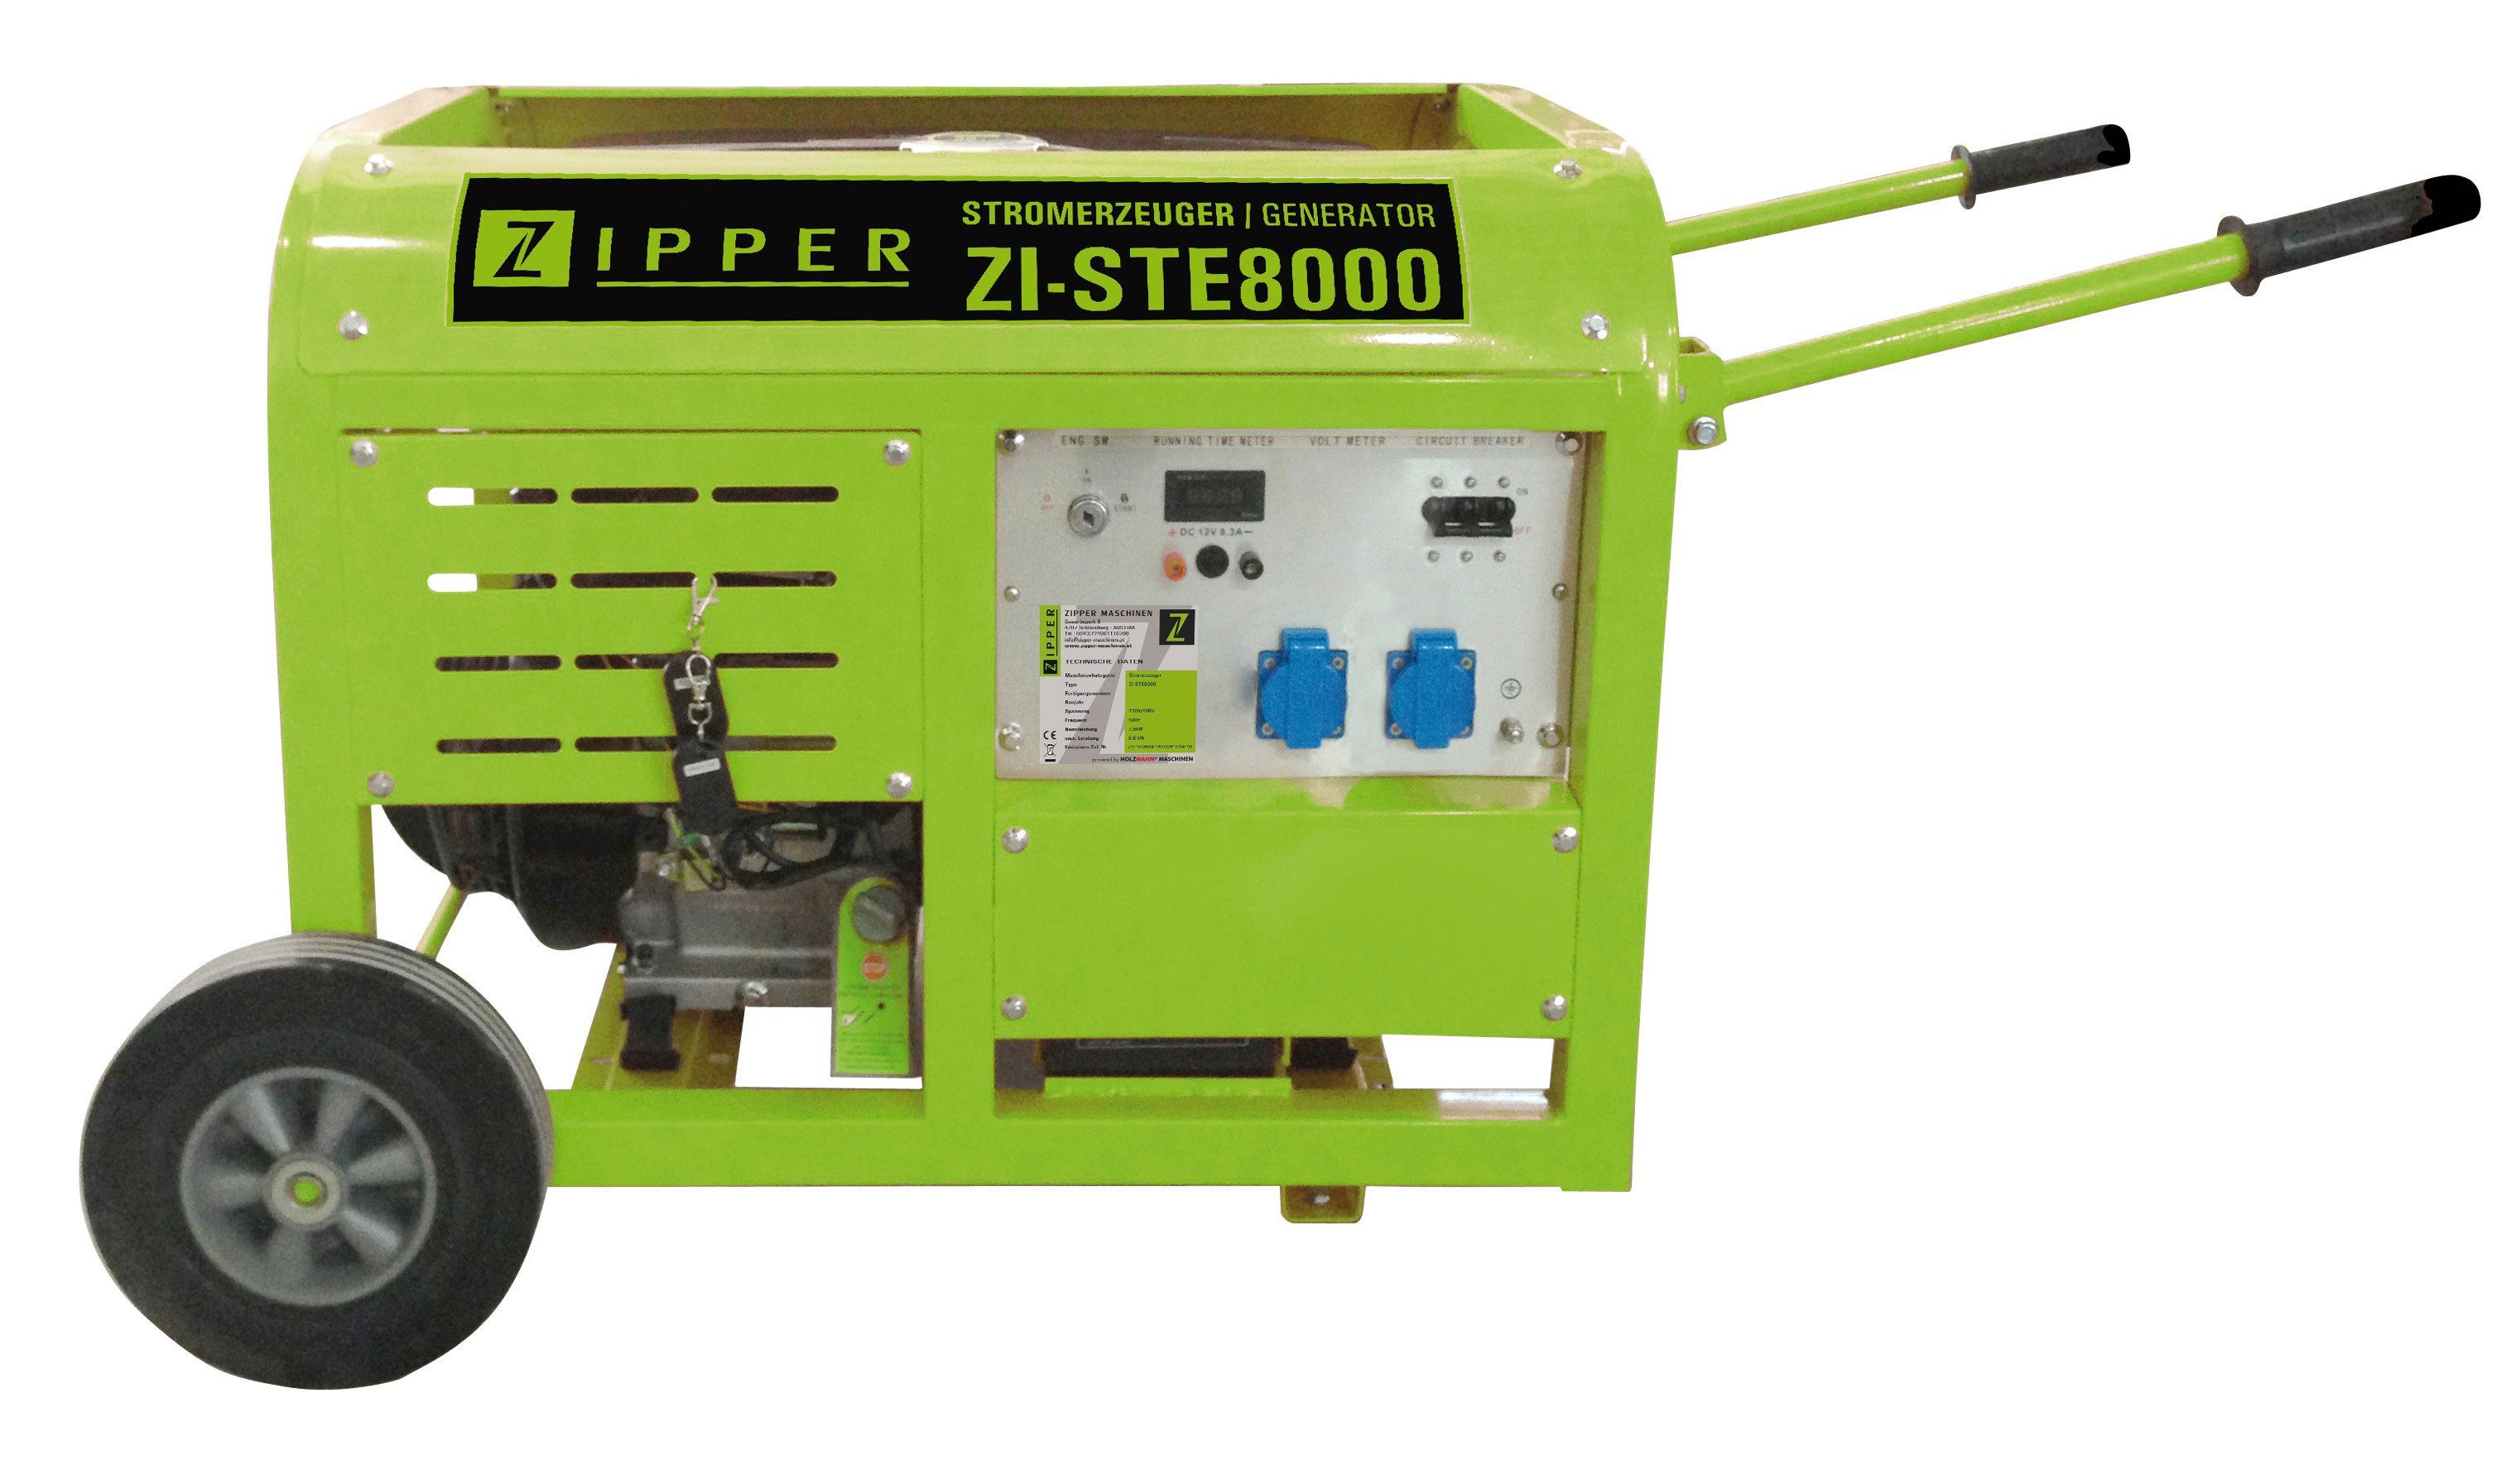 Zipper Stromerzeuger »ZI-STE8000«